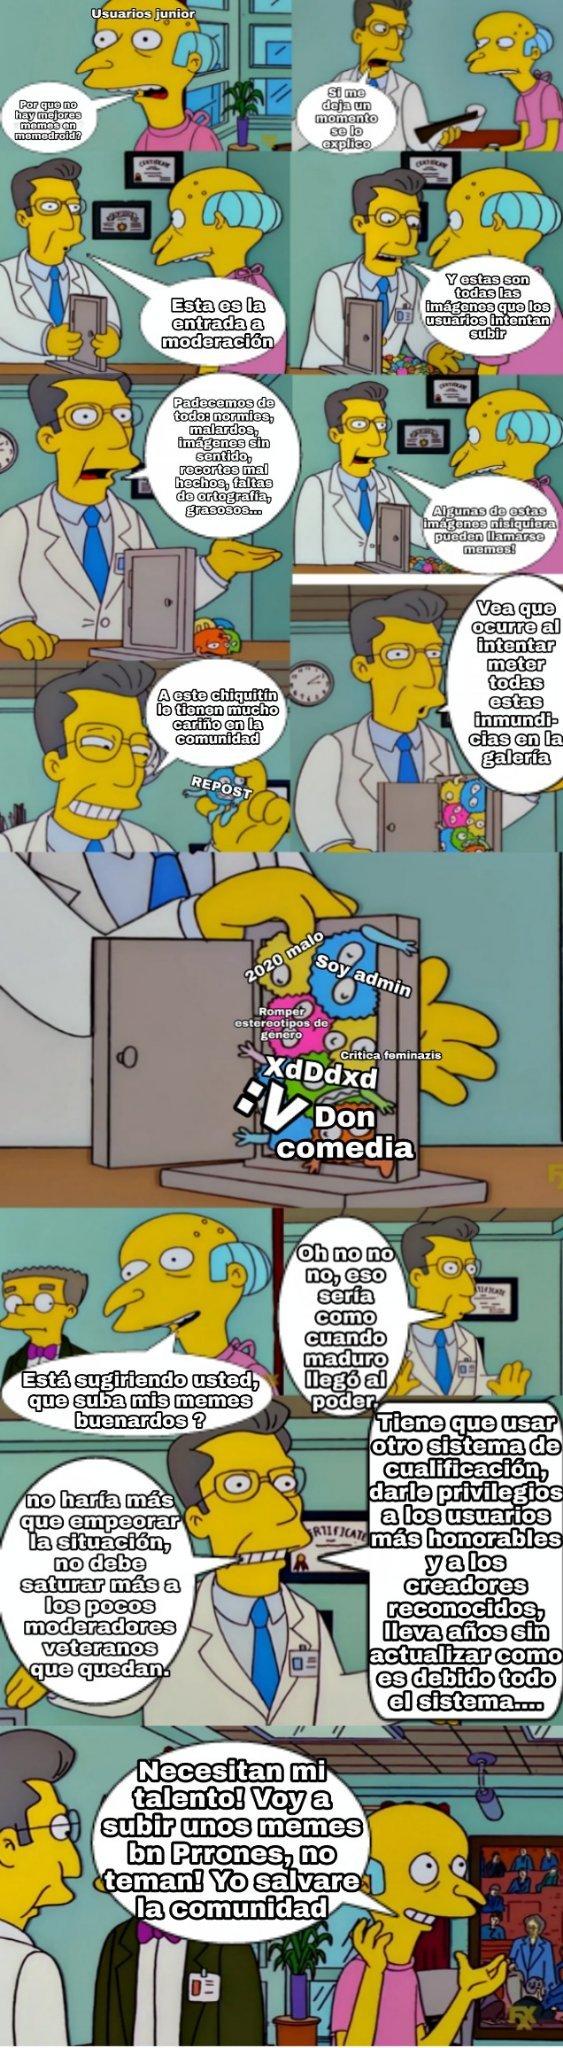 Mucho texto - meme